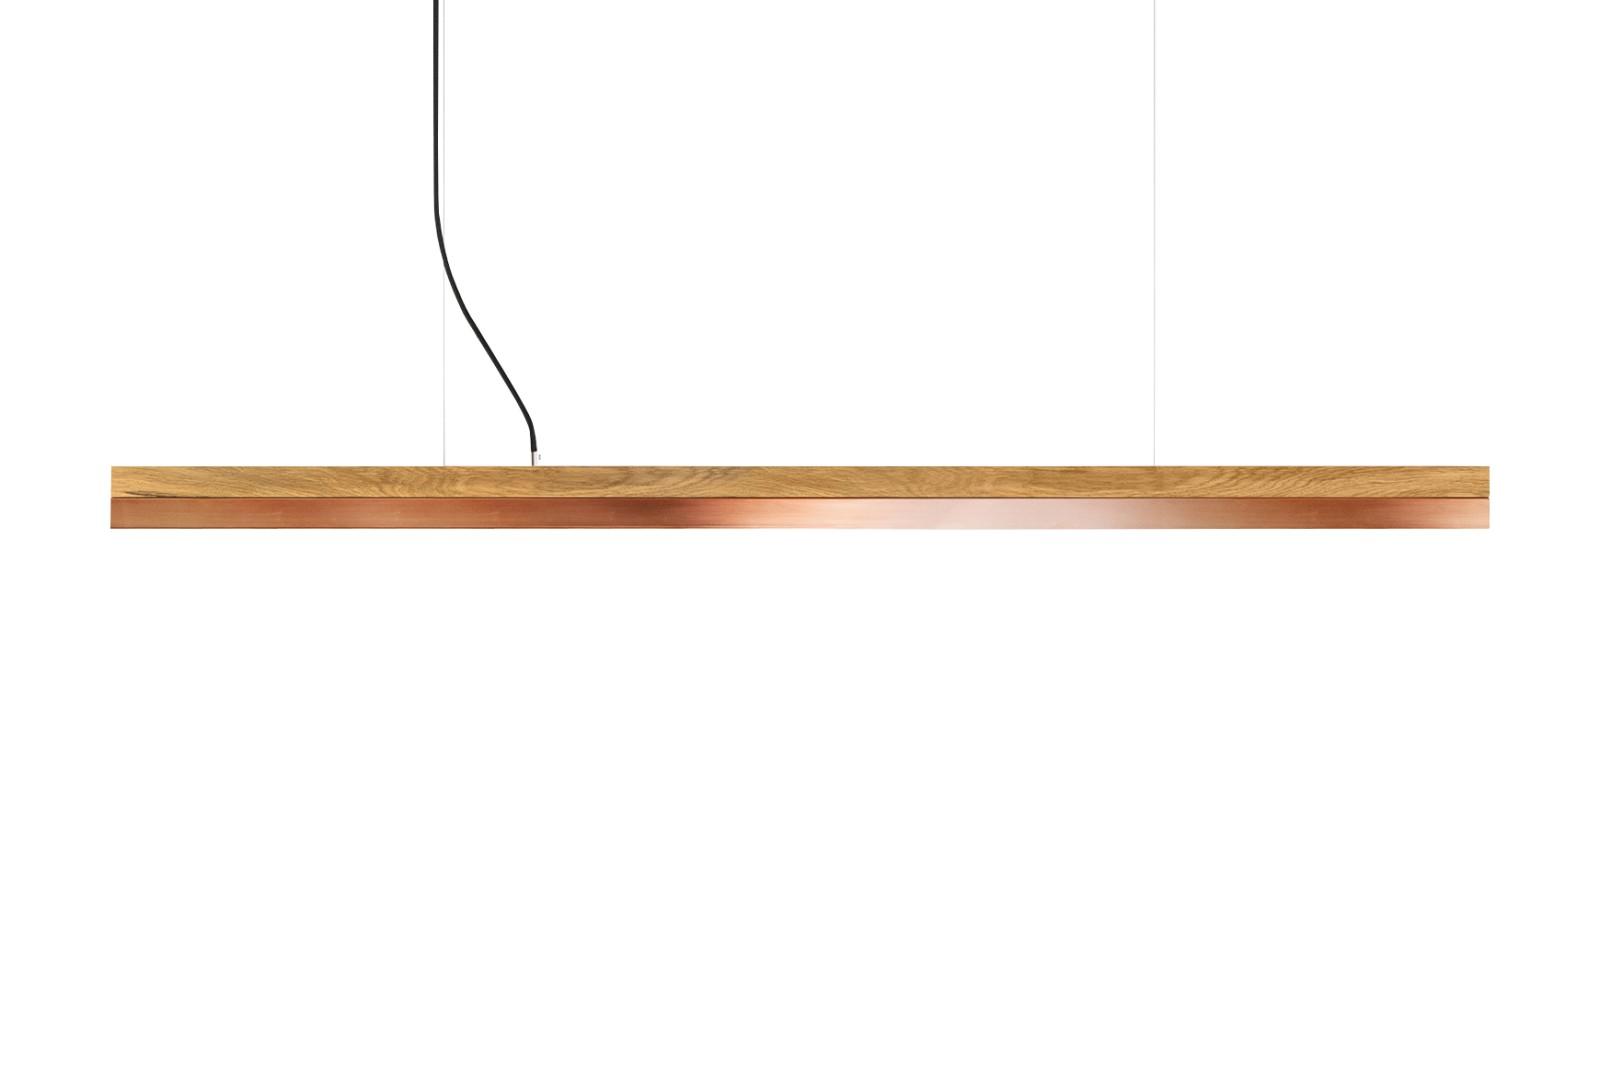 [C] Oak Wood & Copper Pendant Light (92cm, 122cm or 182cm) [C2o] - 92cm, 2700k